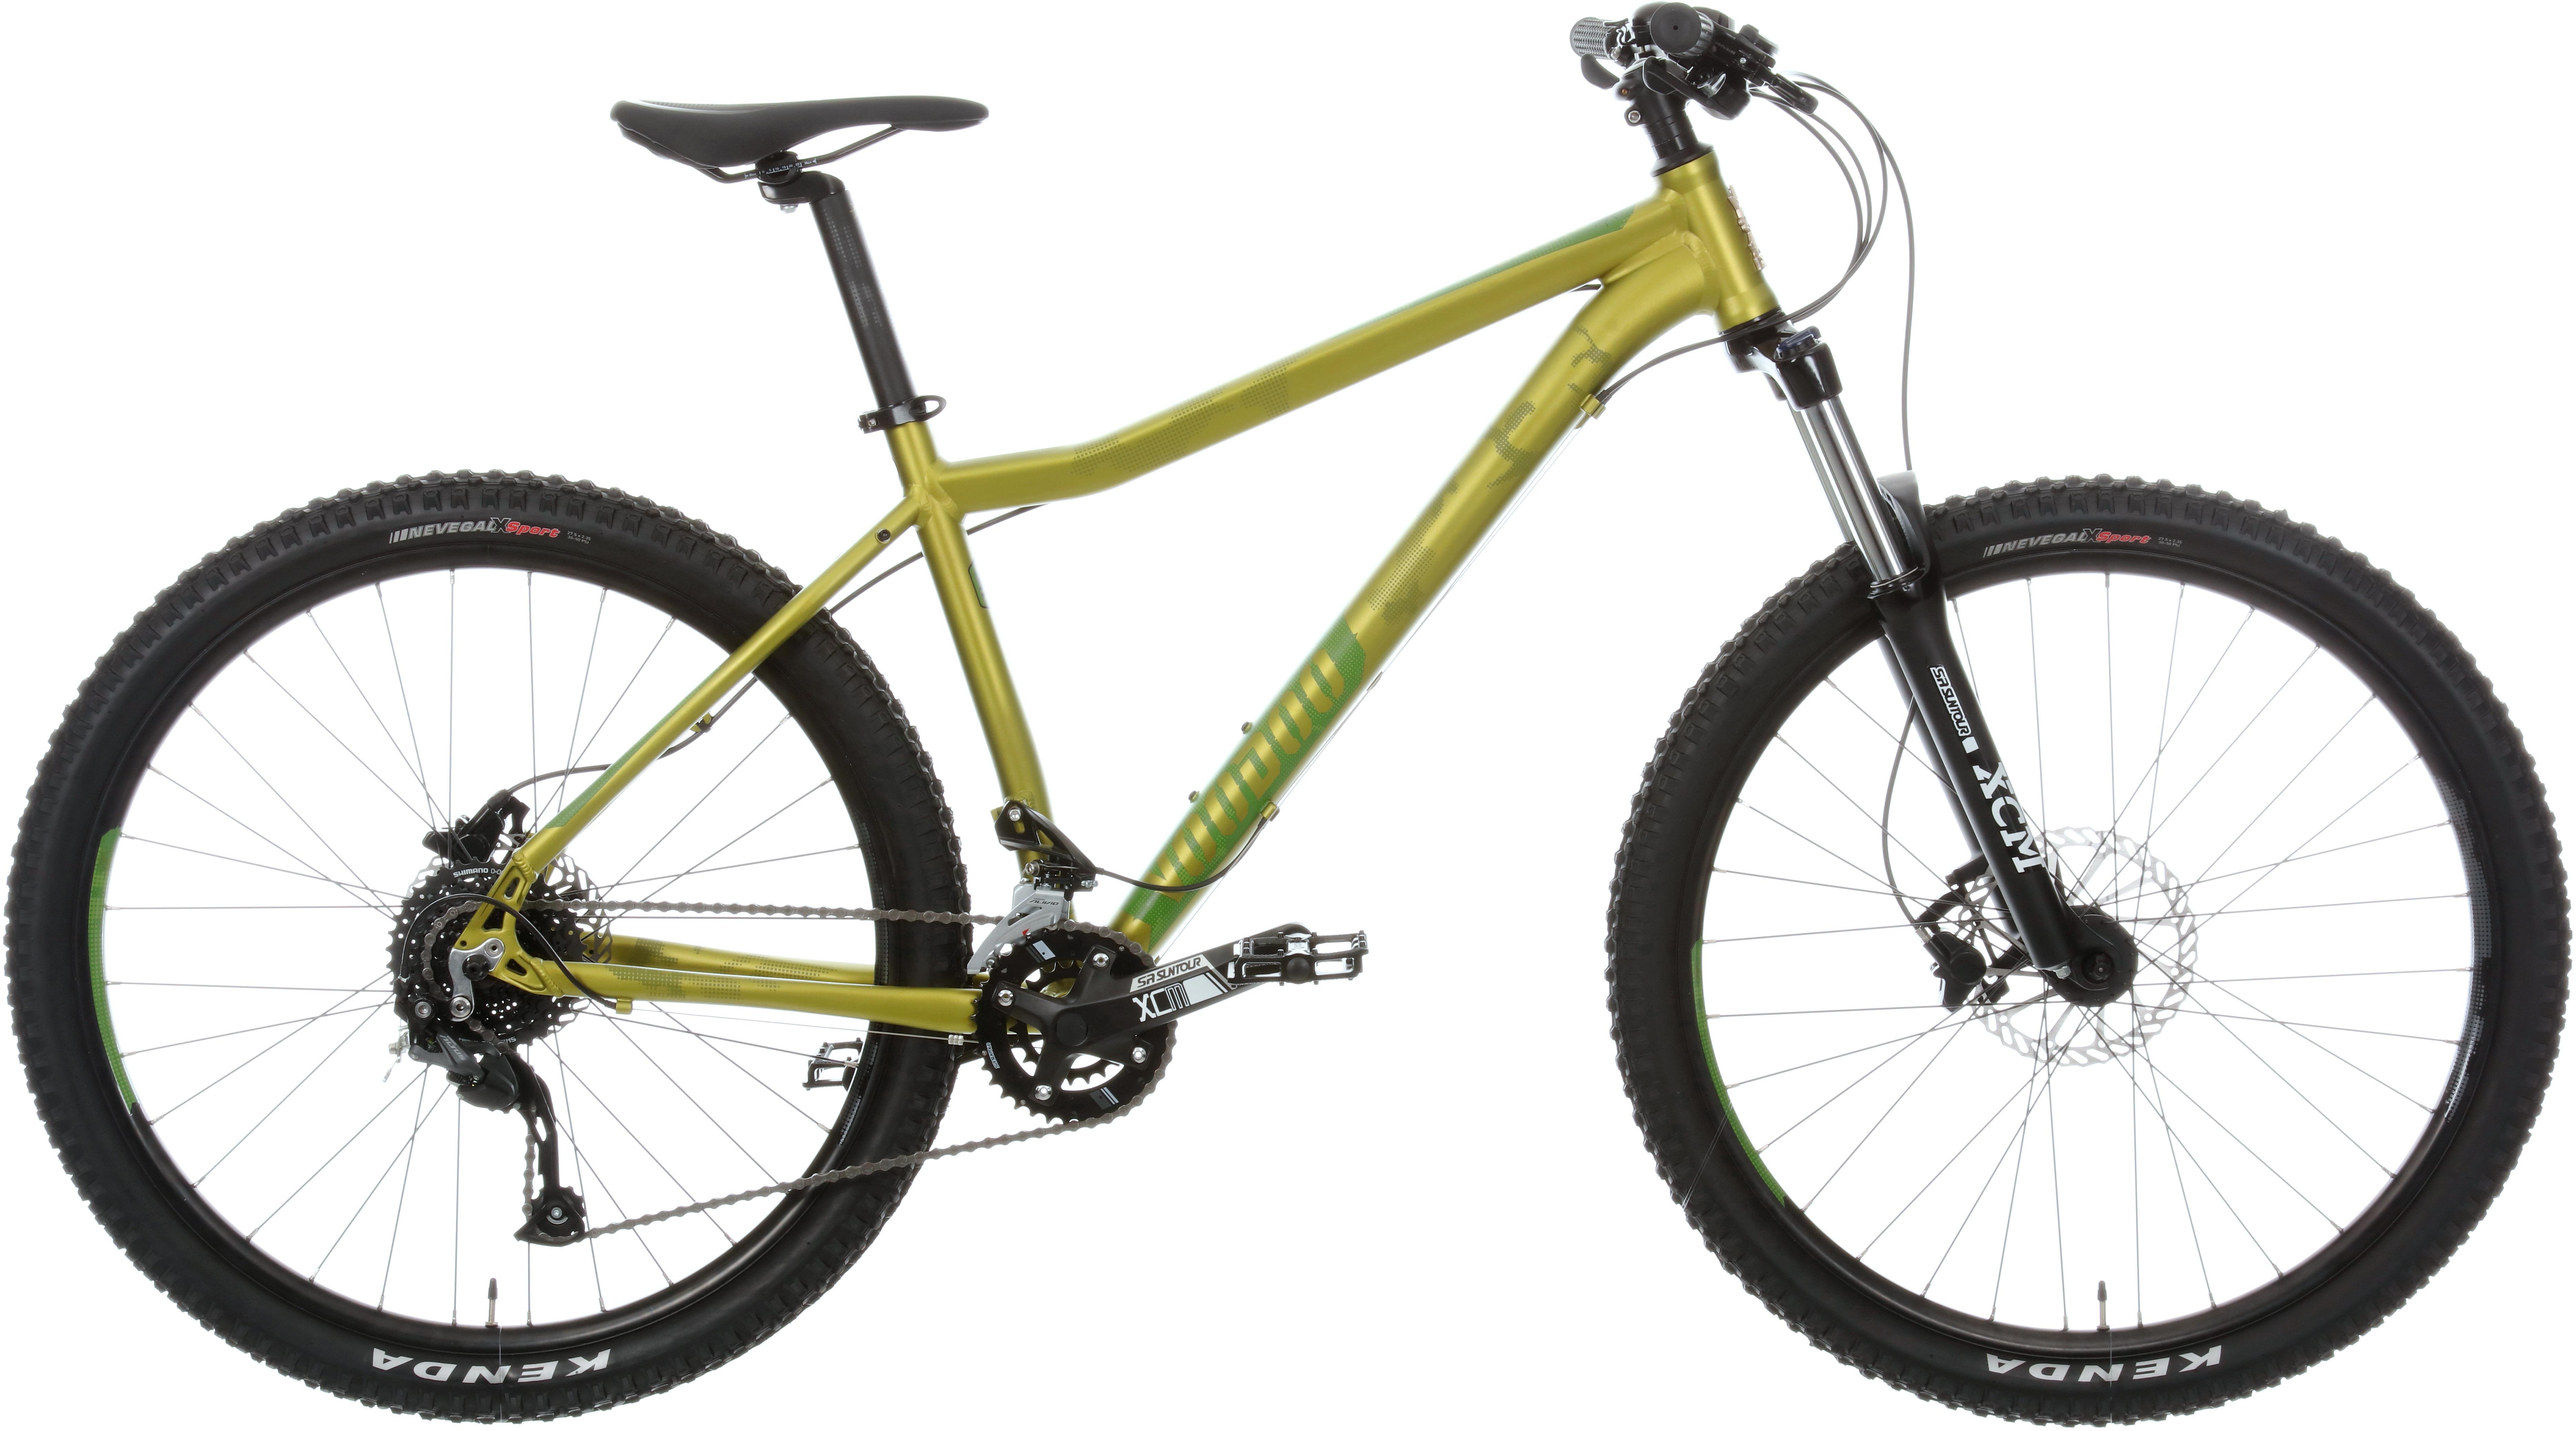 Voodoo Braag Limited Edition Mens Mountain Bike 2020 - S